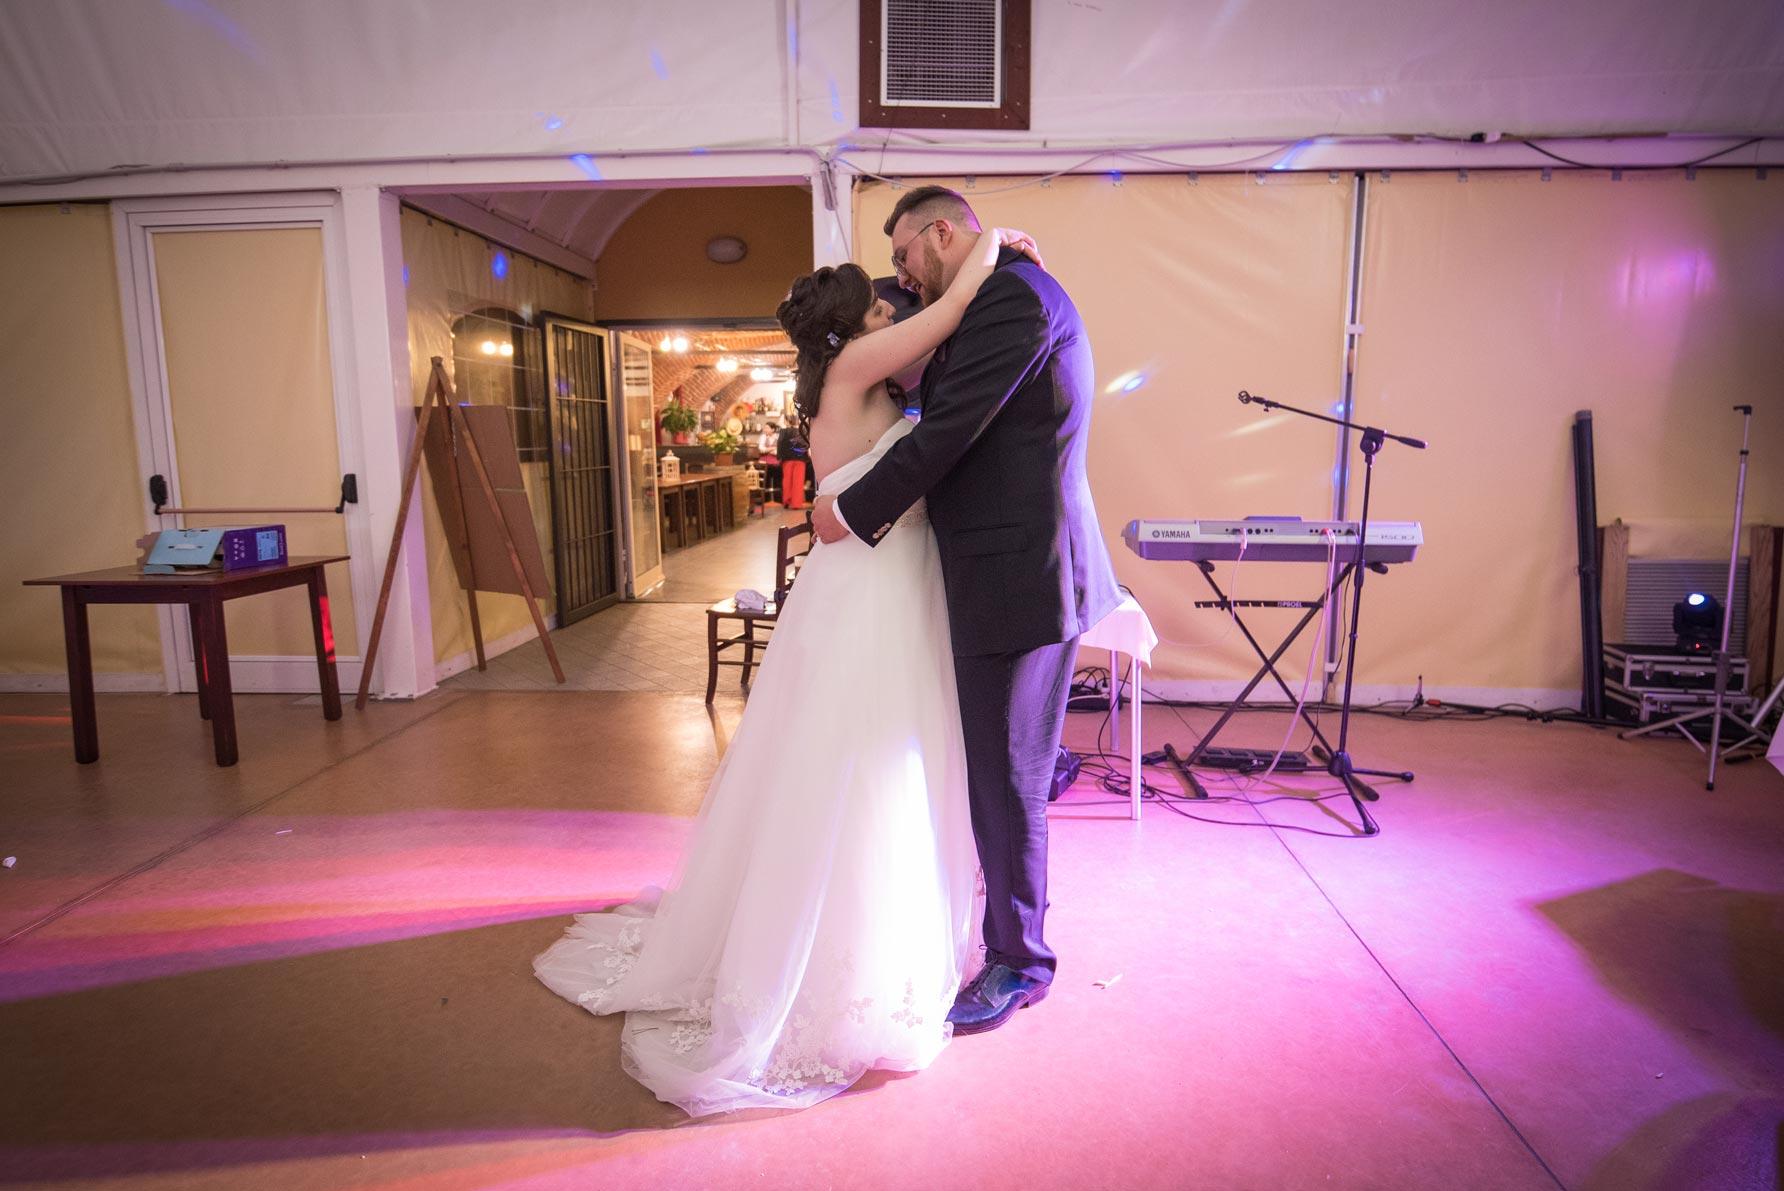 Matrimonio a Narzole Lorenza Diego - DSC 0893 - Fotografie matrimonio ballo - Fotografie matrimonio ballo